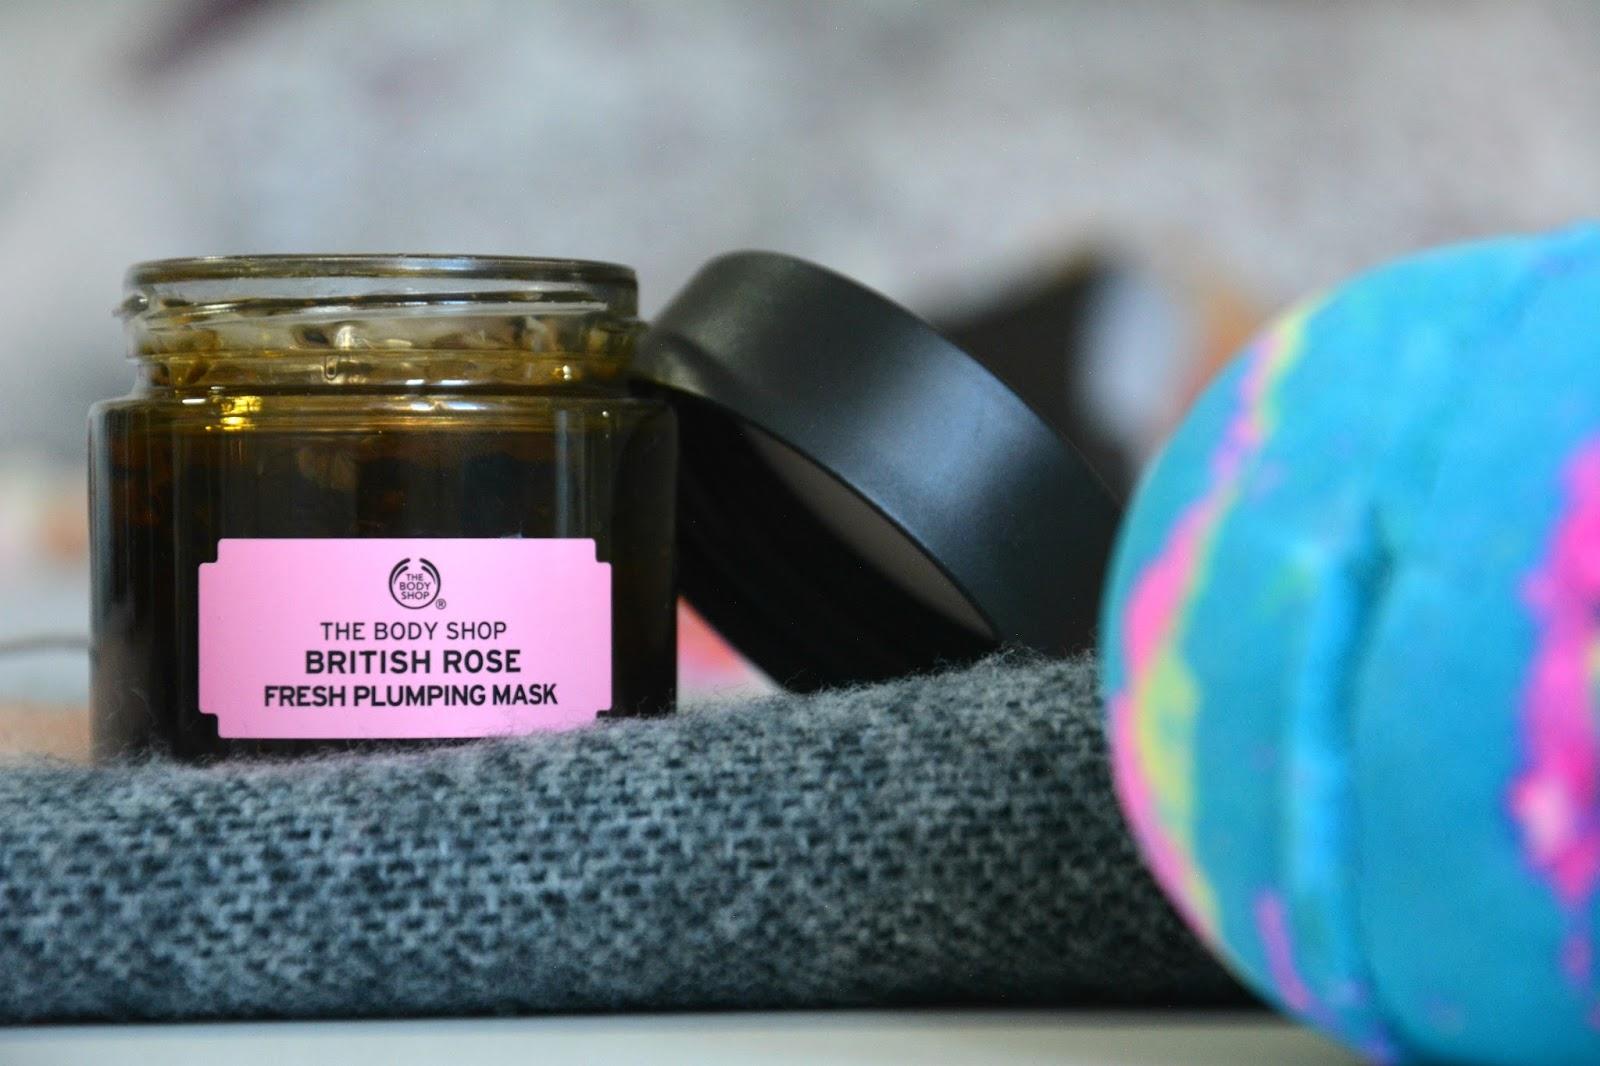 The Body Shop British Rose Fresh Plumping Mask; Lush Intergalactic Bathbomb; Pimkie Scarf